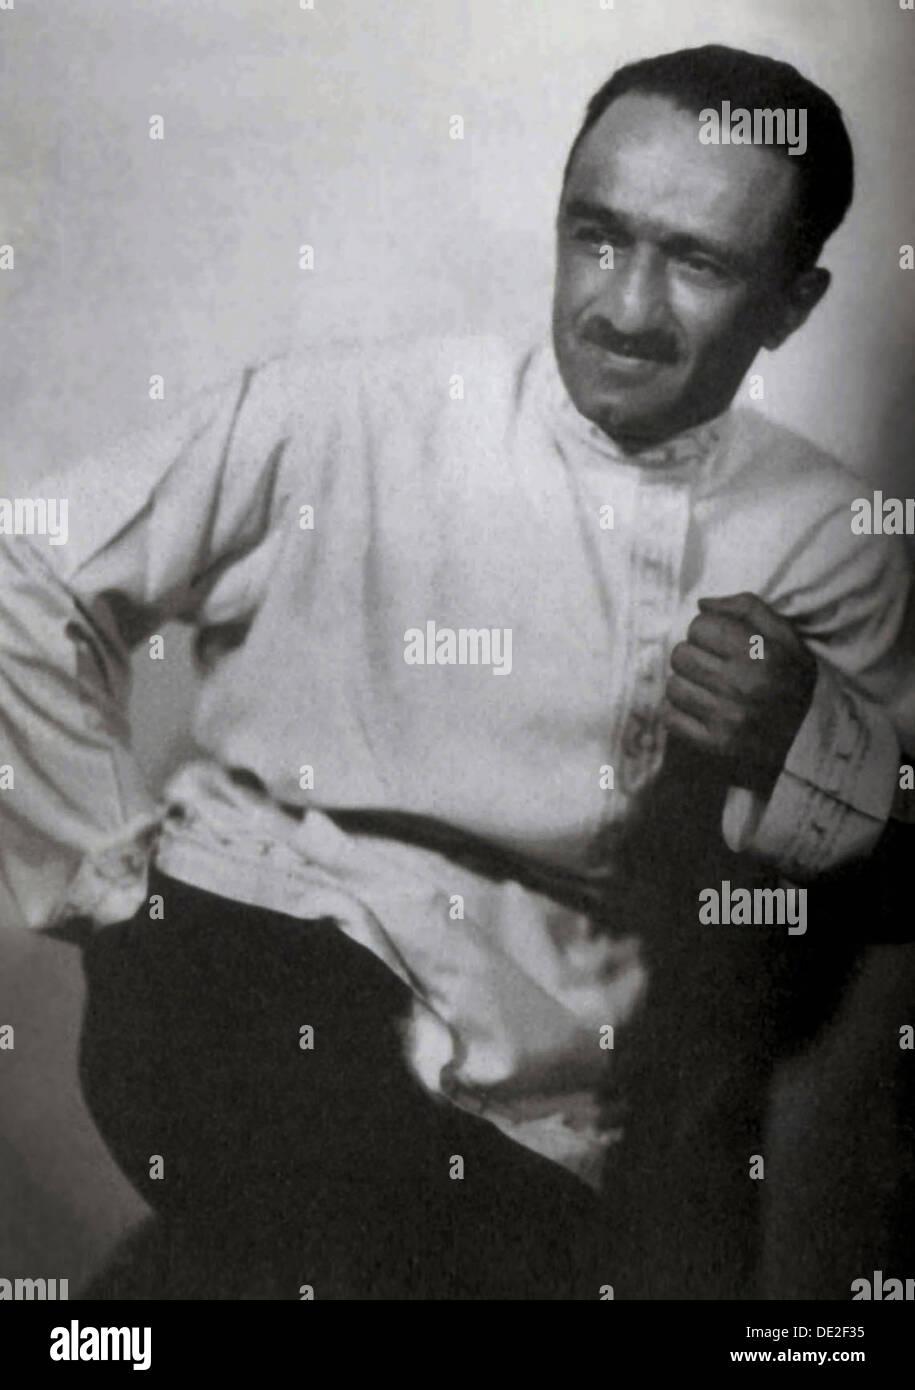 Anastas Mikoyan, Russian communist statesman, c1920s-c1930s. - Stock Image